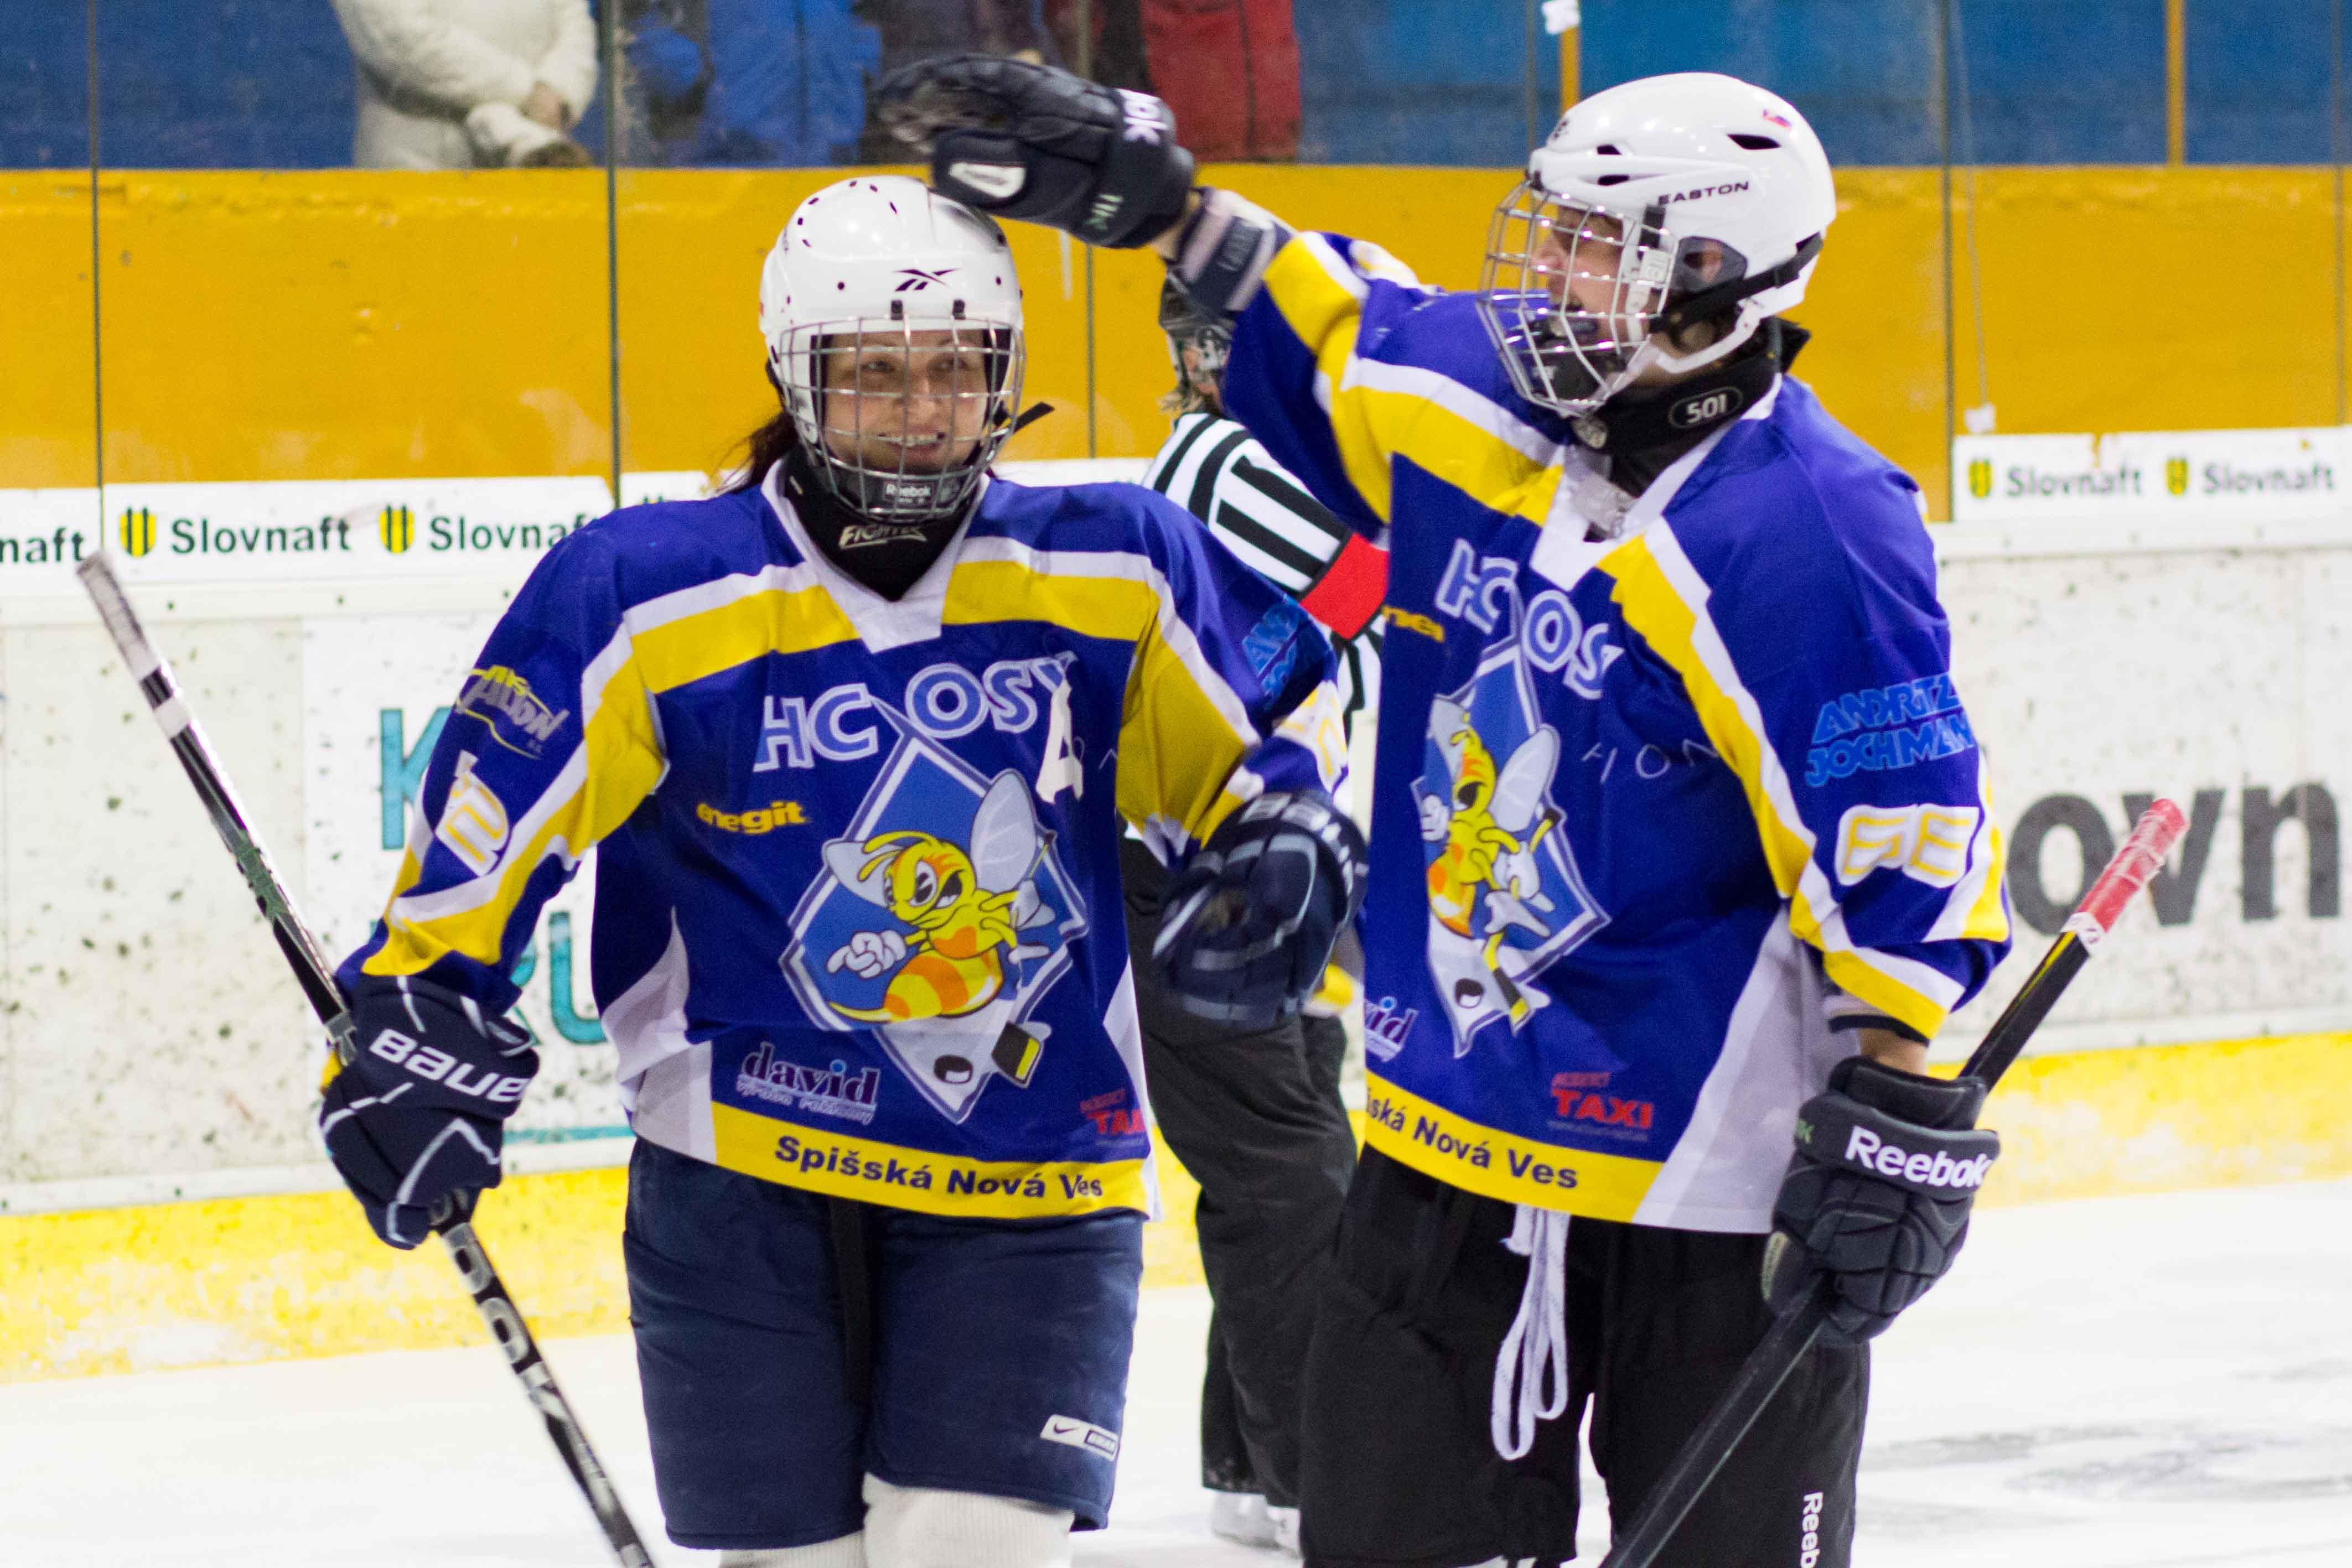 zhkm-zvolen-hc-spisska-n-ves-2013-hokej-14